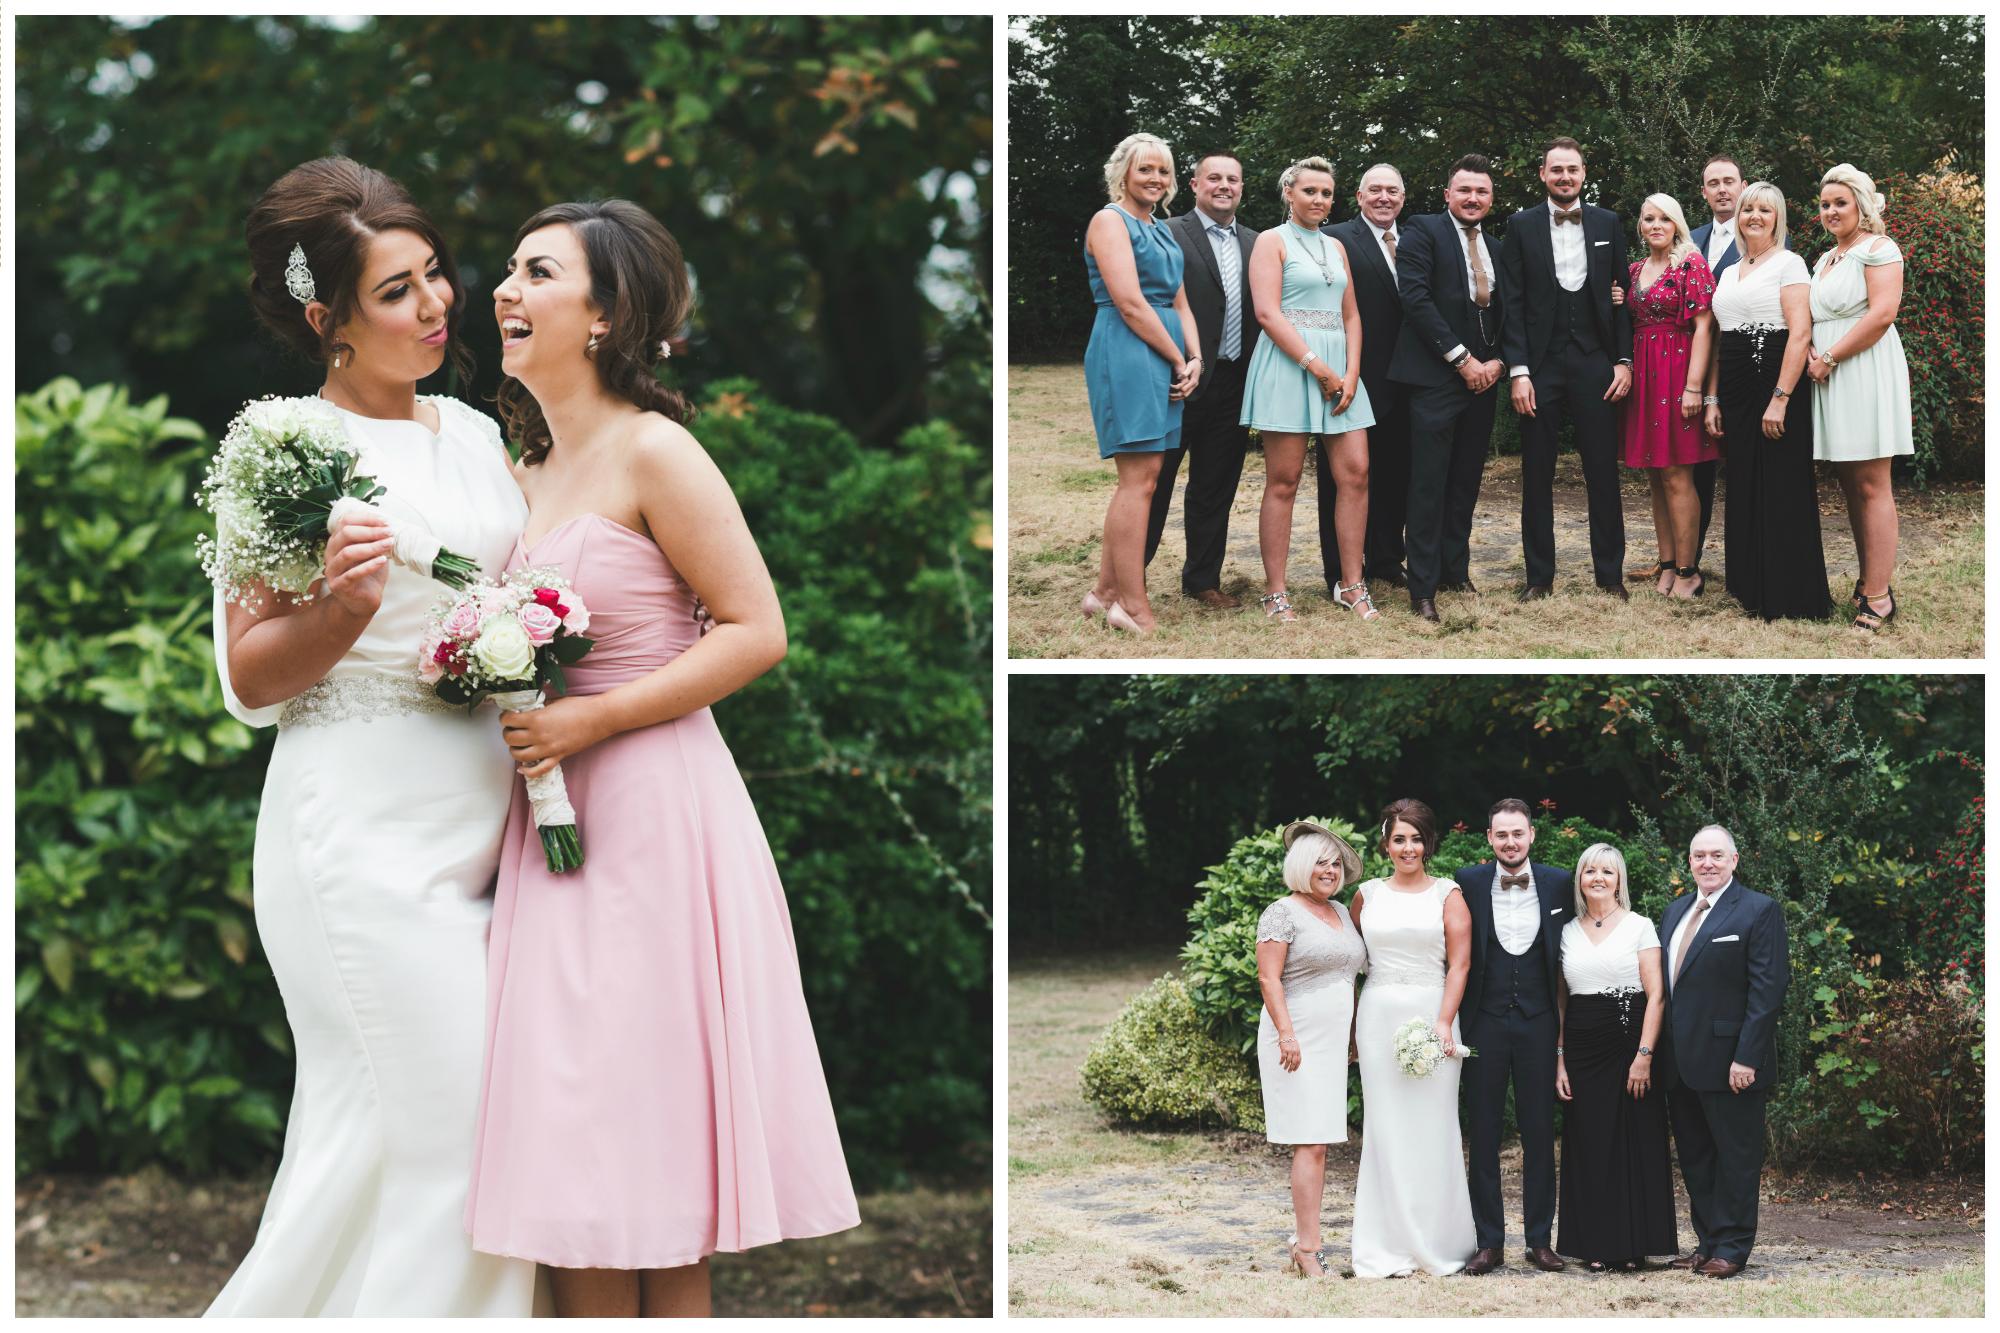 Lisburn_Wedding_Photographer_Purephotoni_Weavers_Lodge_Group.jpg